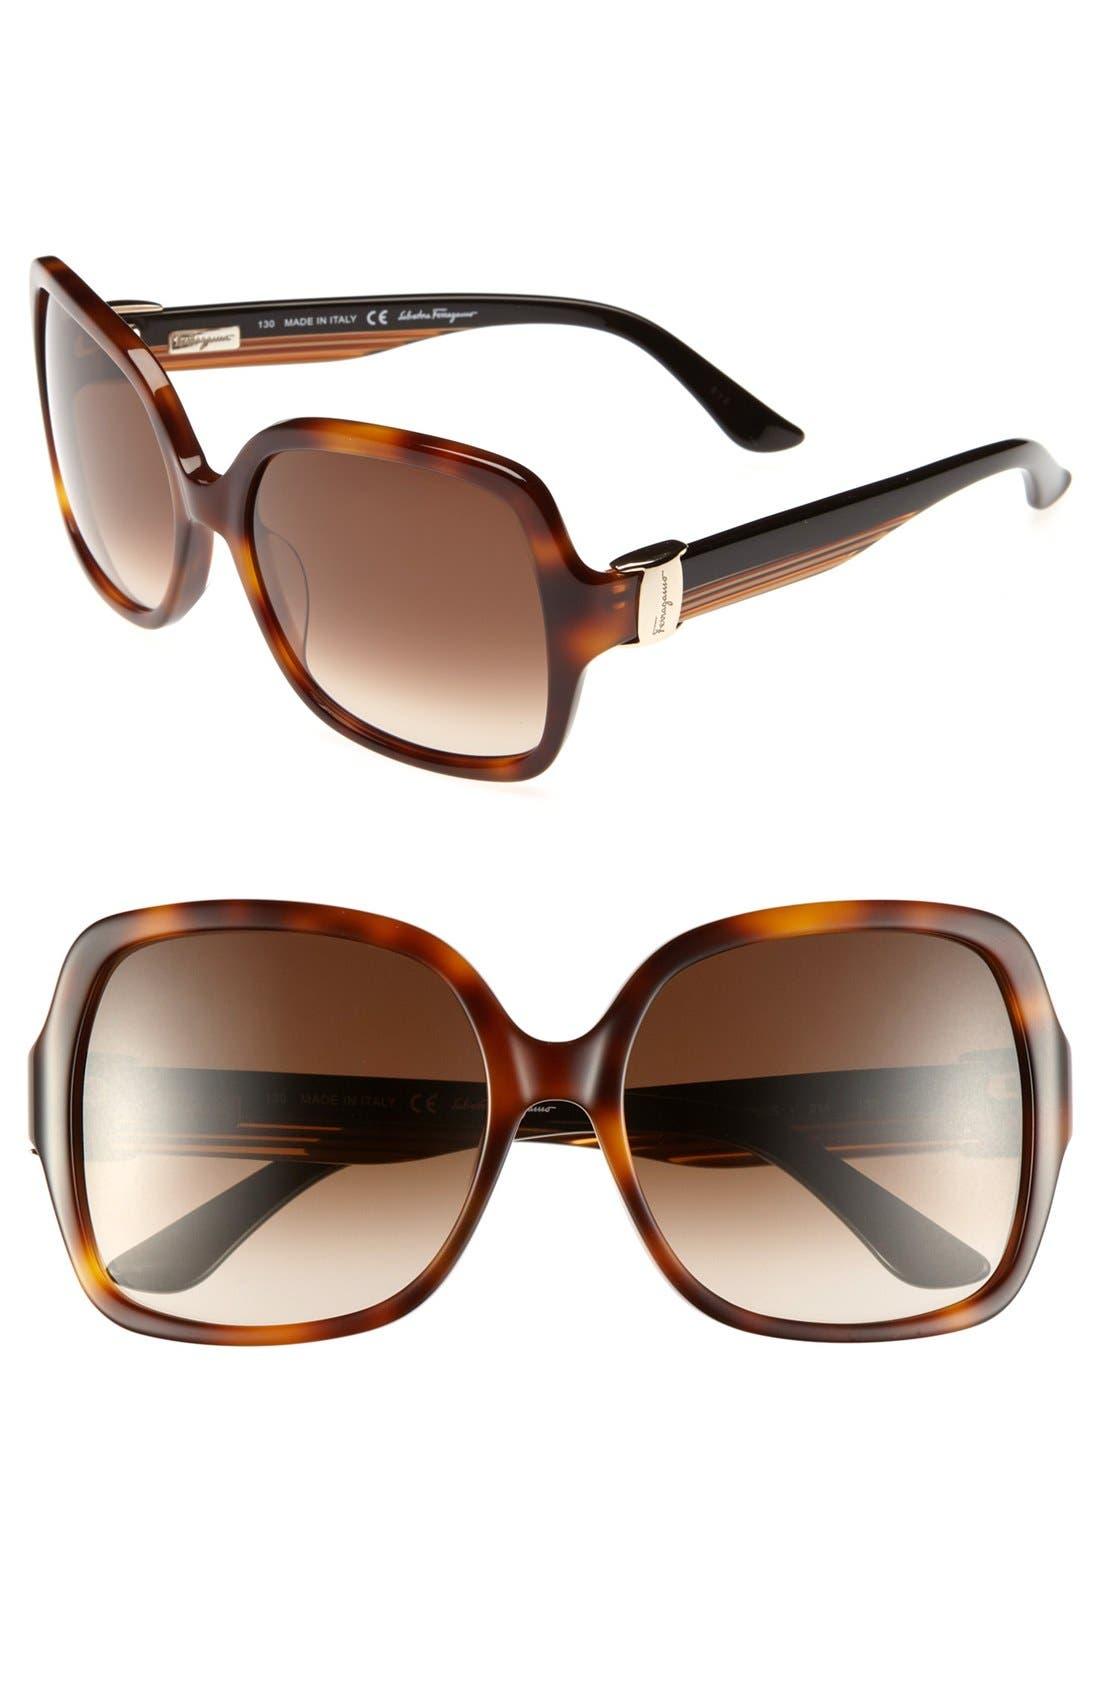 Main Image - Salvatore Ferragamo 56mm Oversized Sunglasses